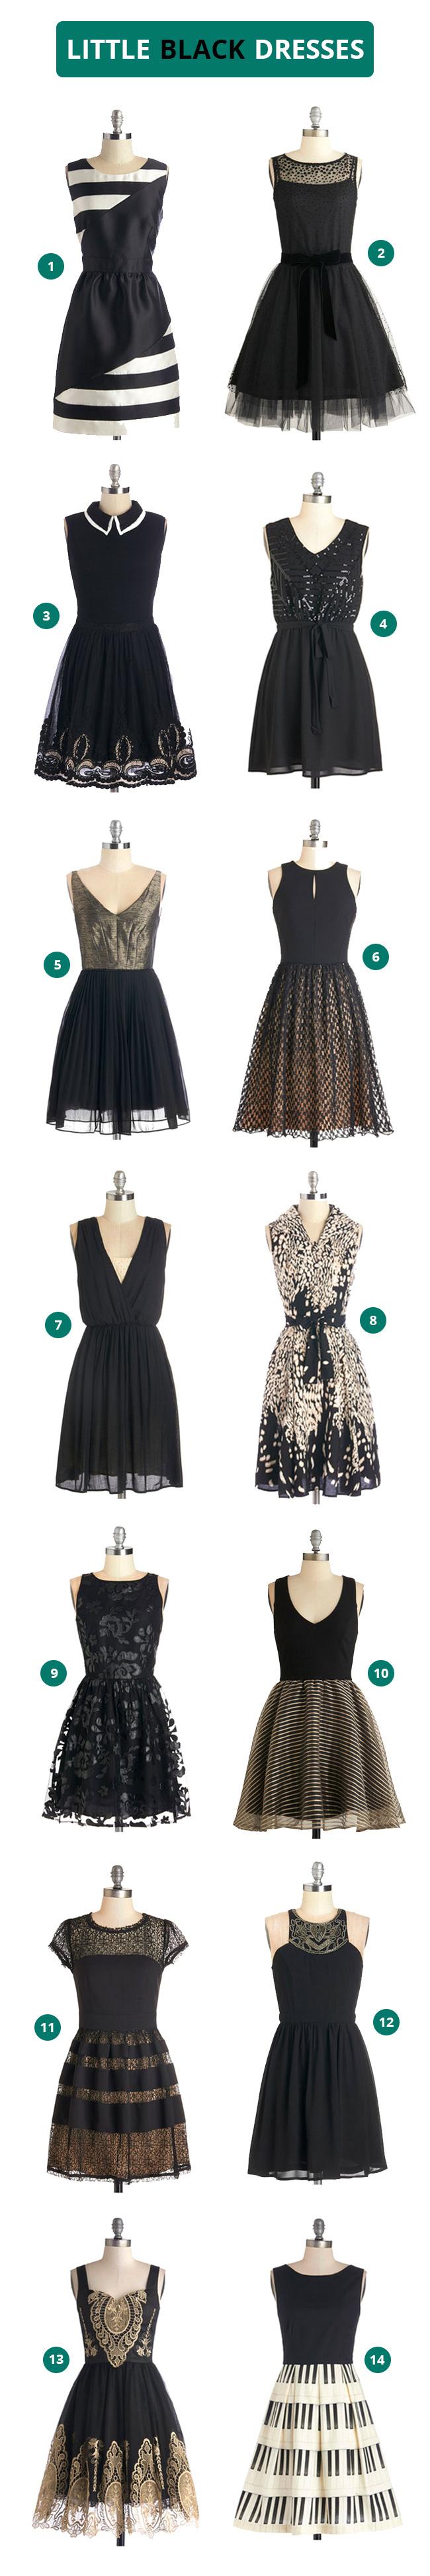 LBD-dresses-modcloth